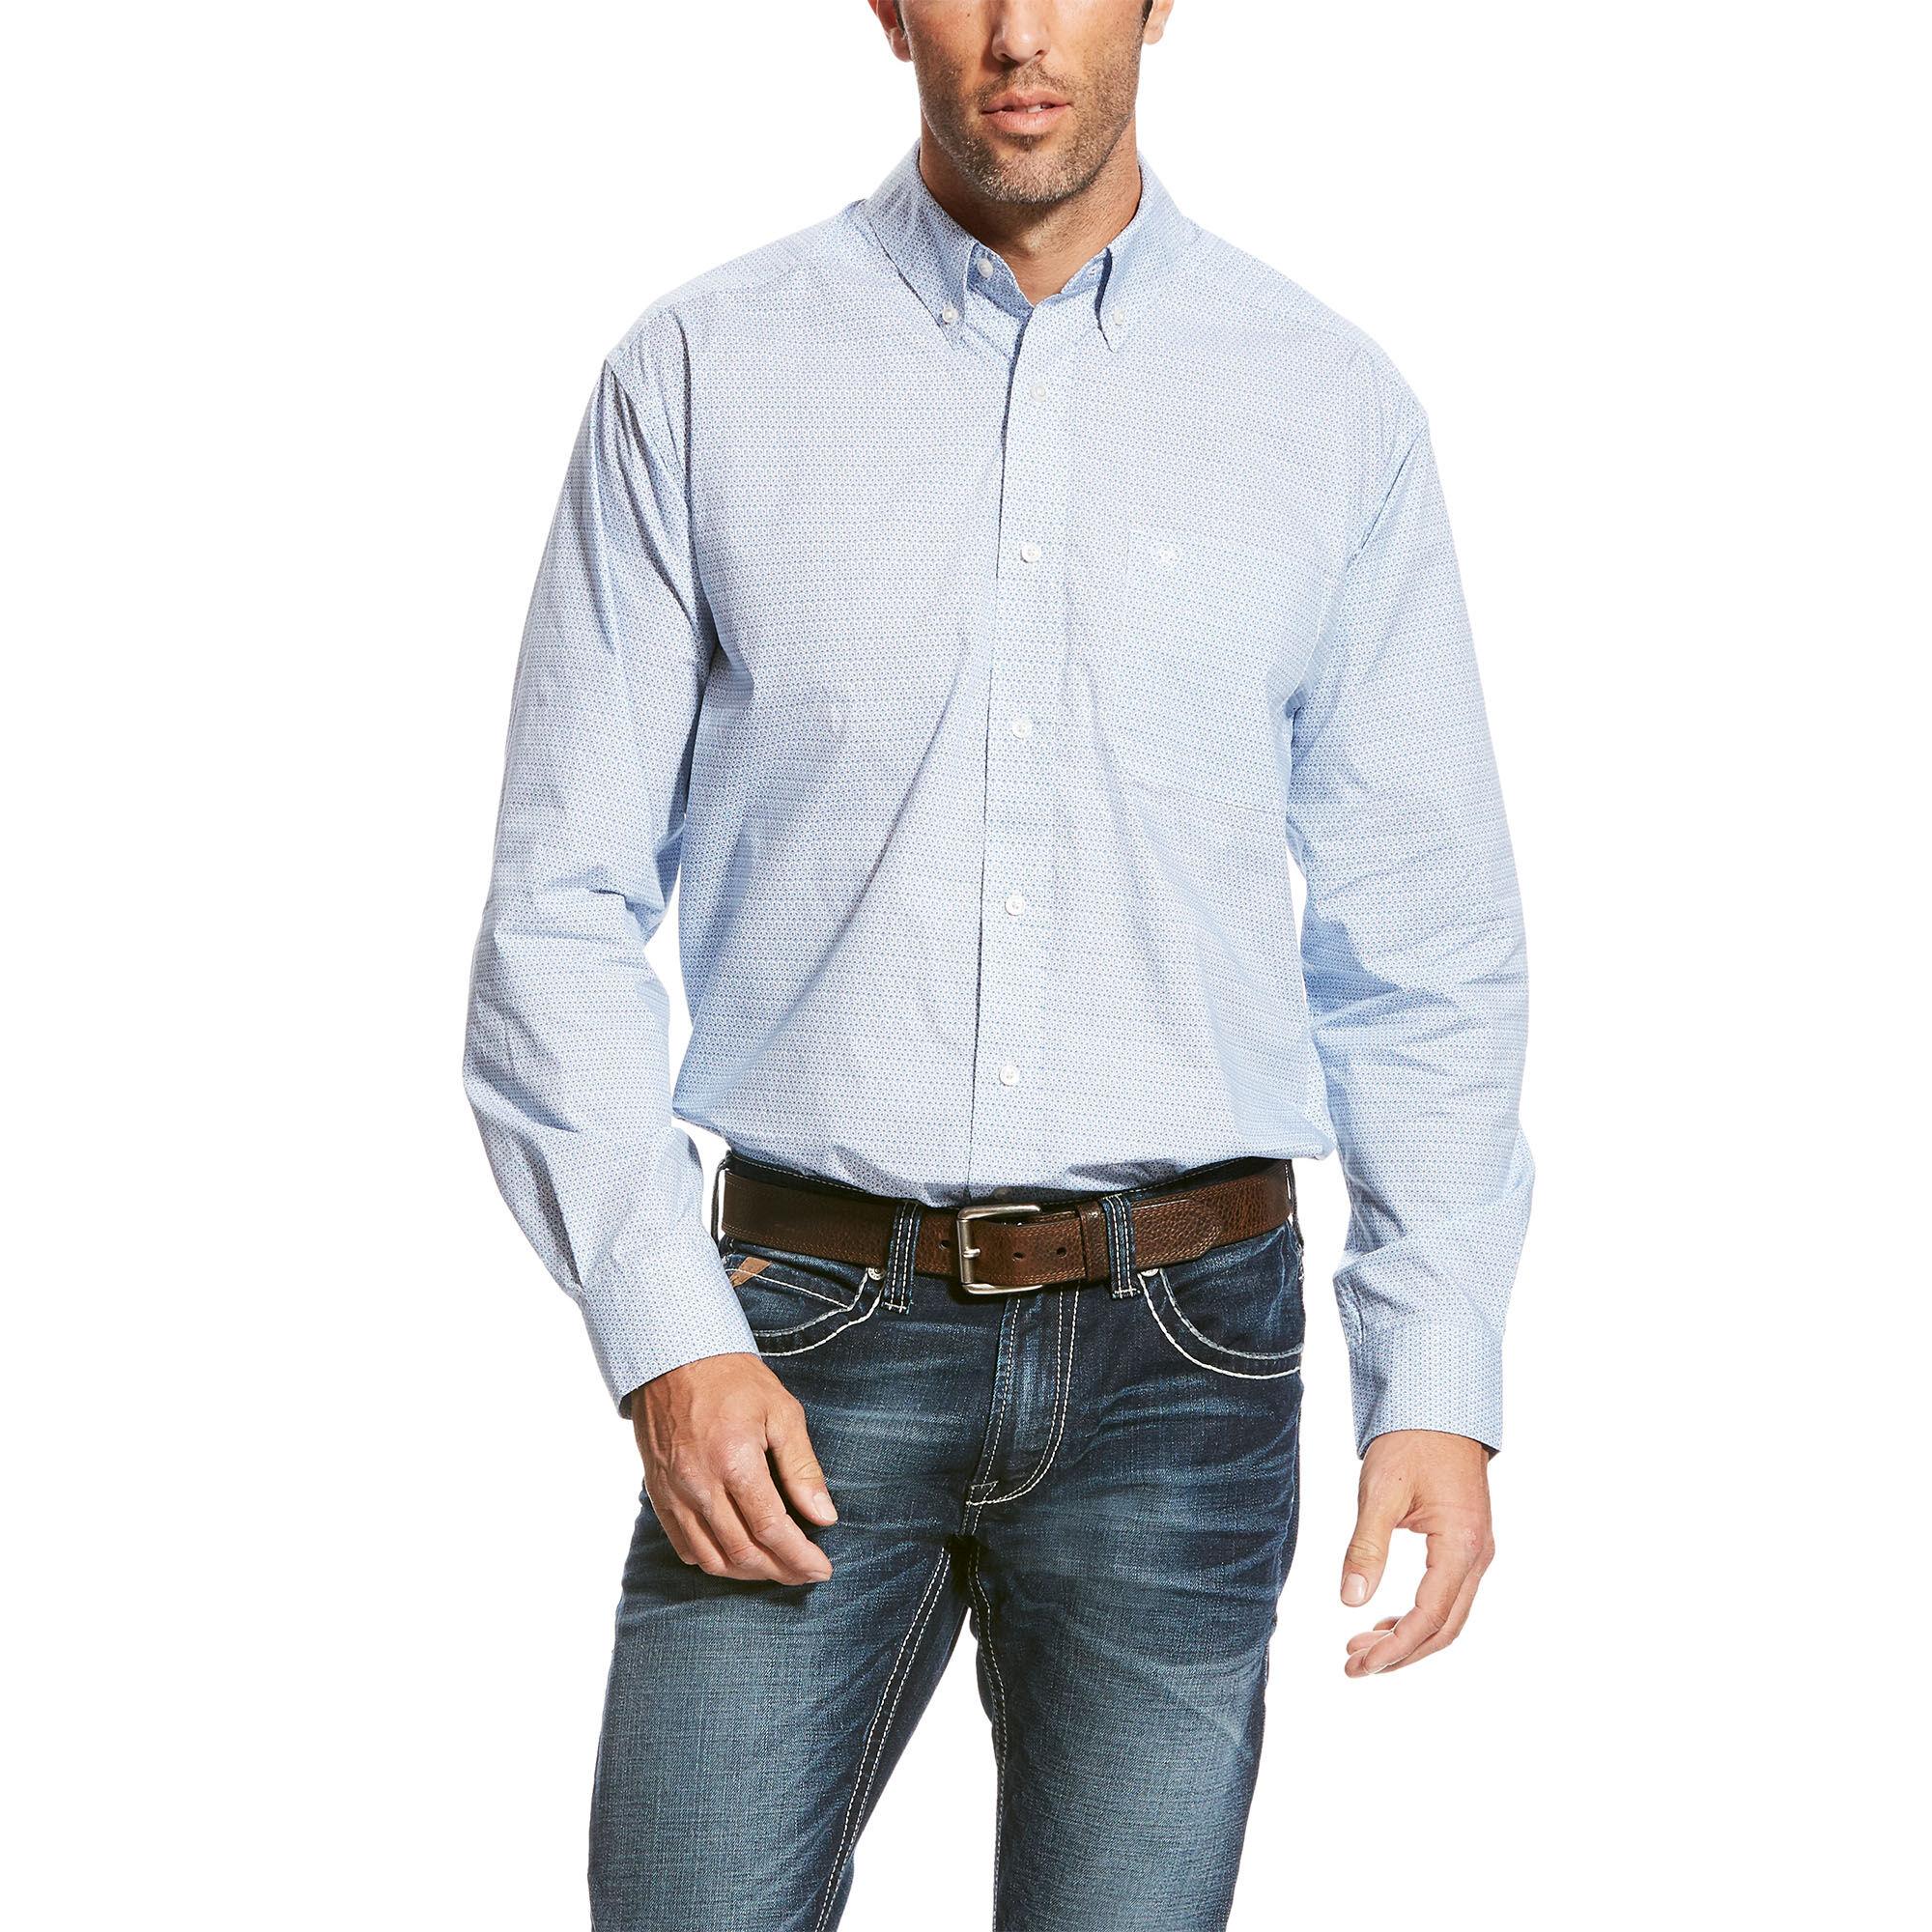 Sodders Shirt